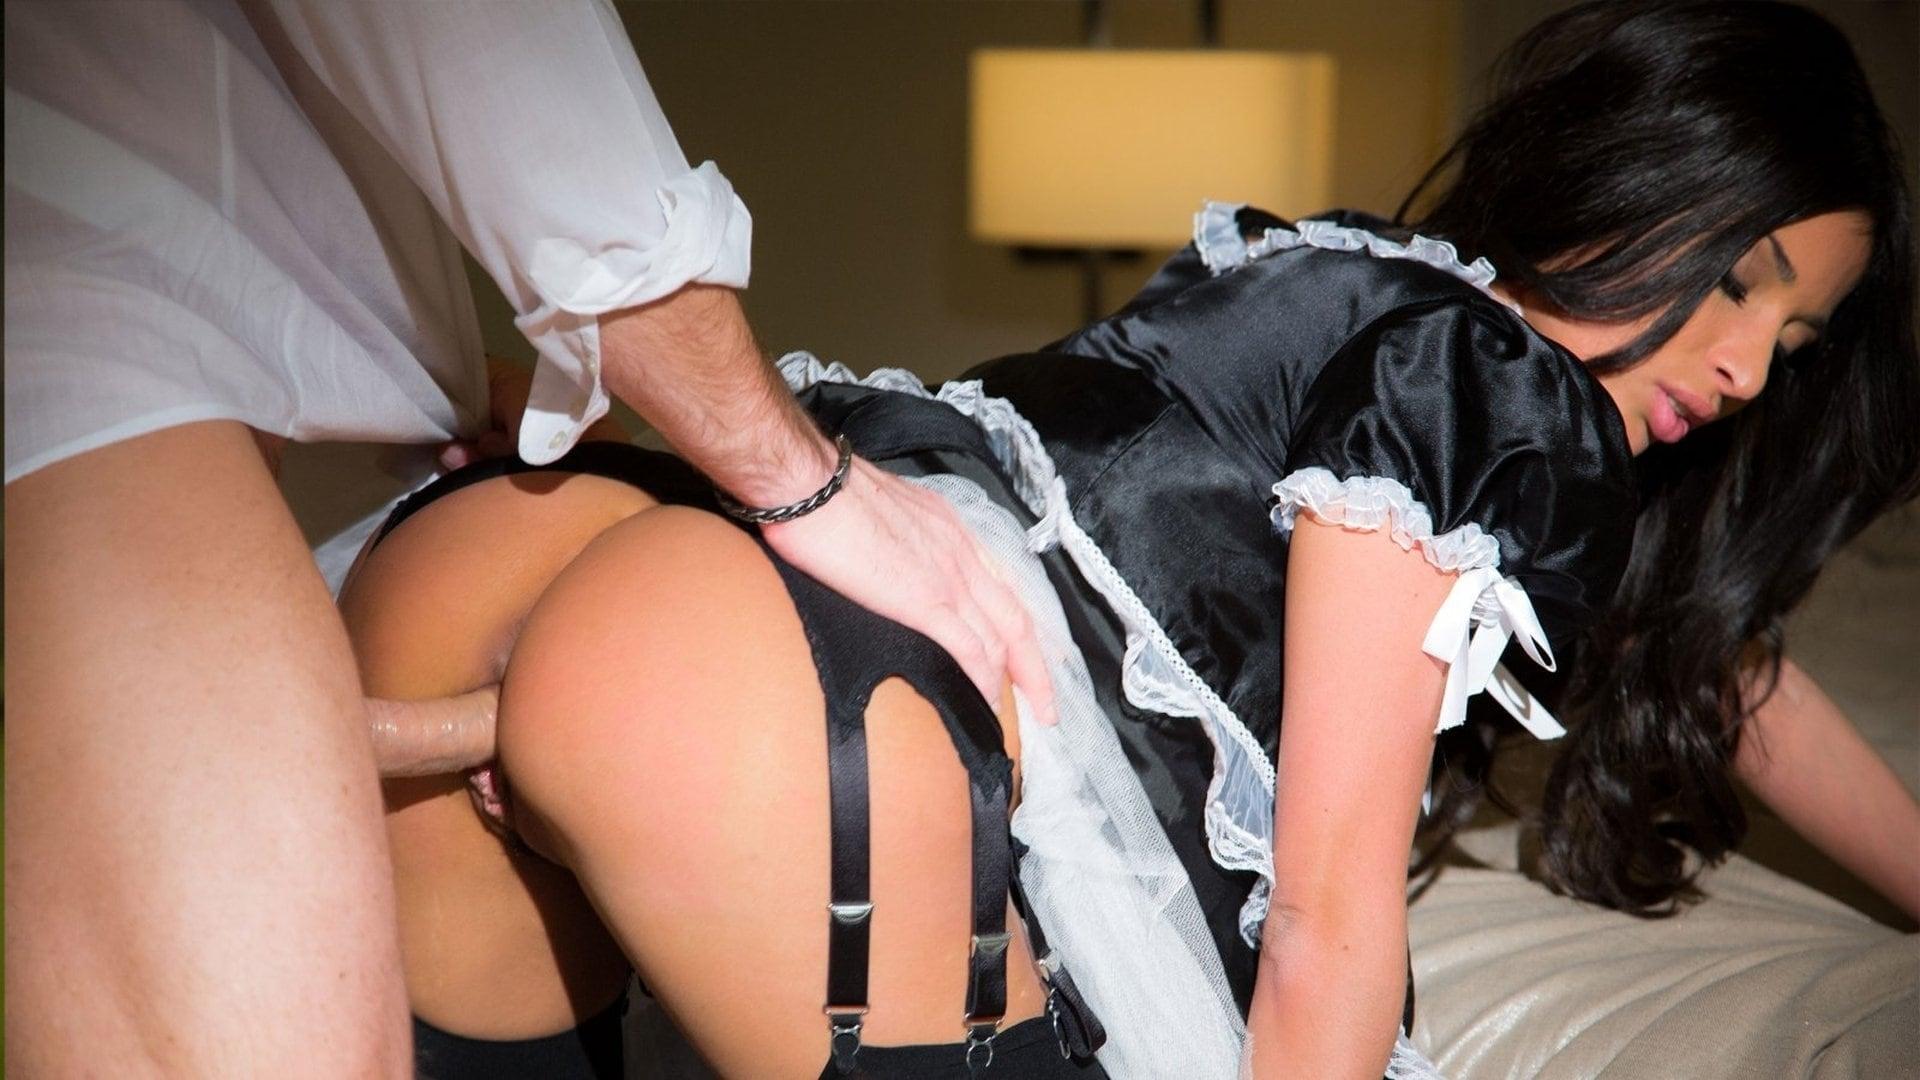 Free Hd Sally's Maid Service Porn Photo